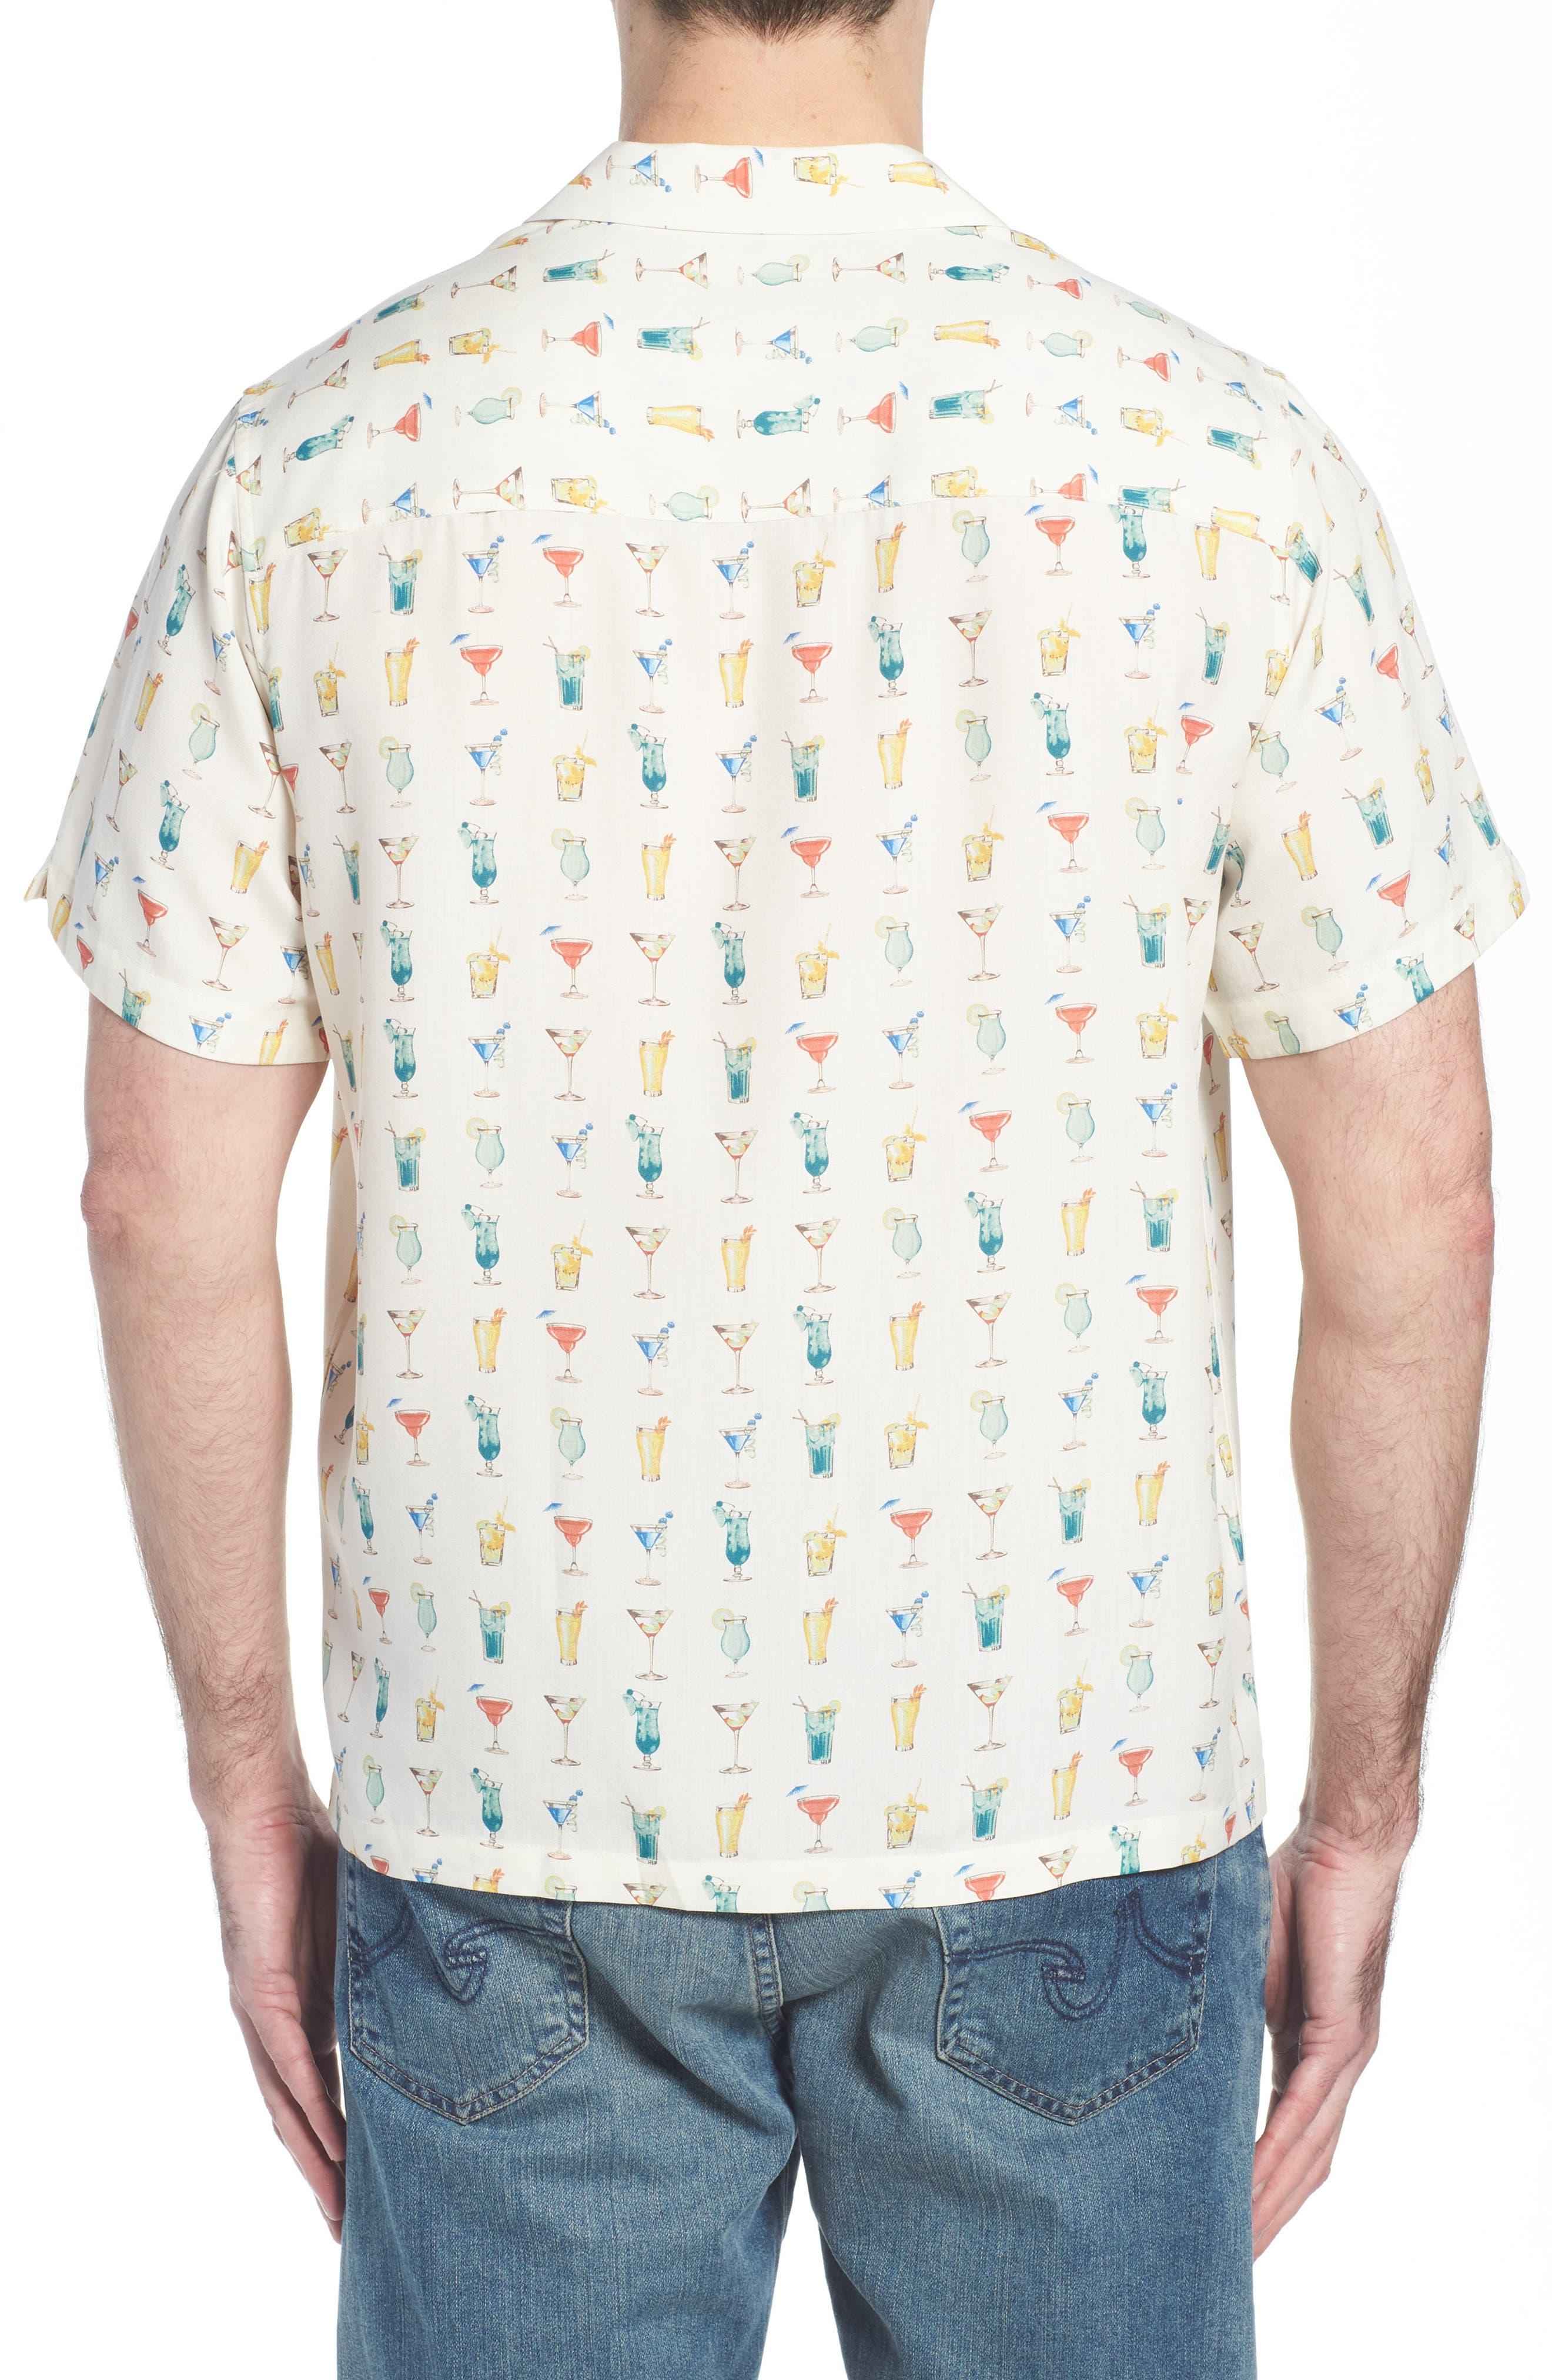 Mixalot Trim Fit Silk Blend Camp Shirt,                             Alternate thumbnail 5, color,                             Off White